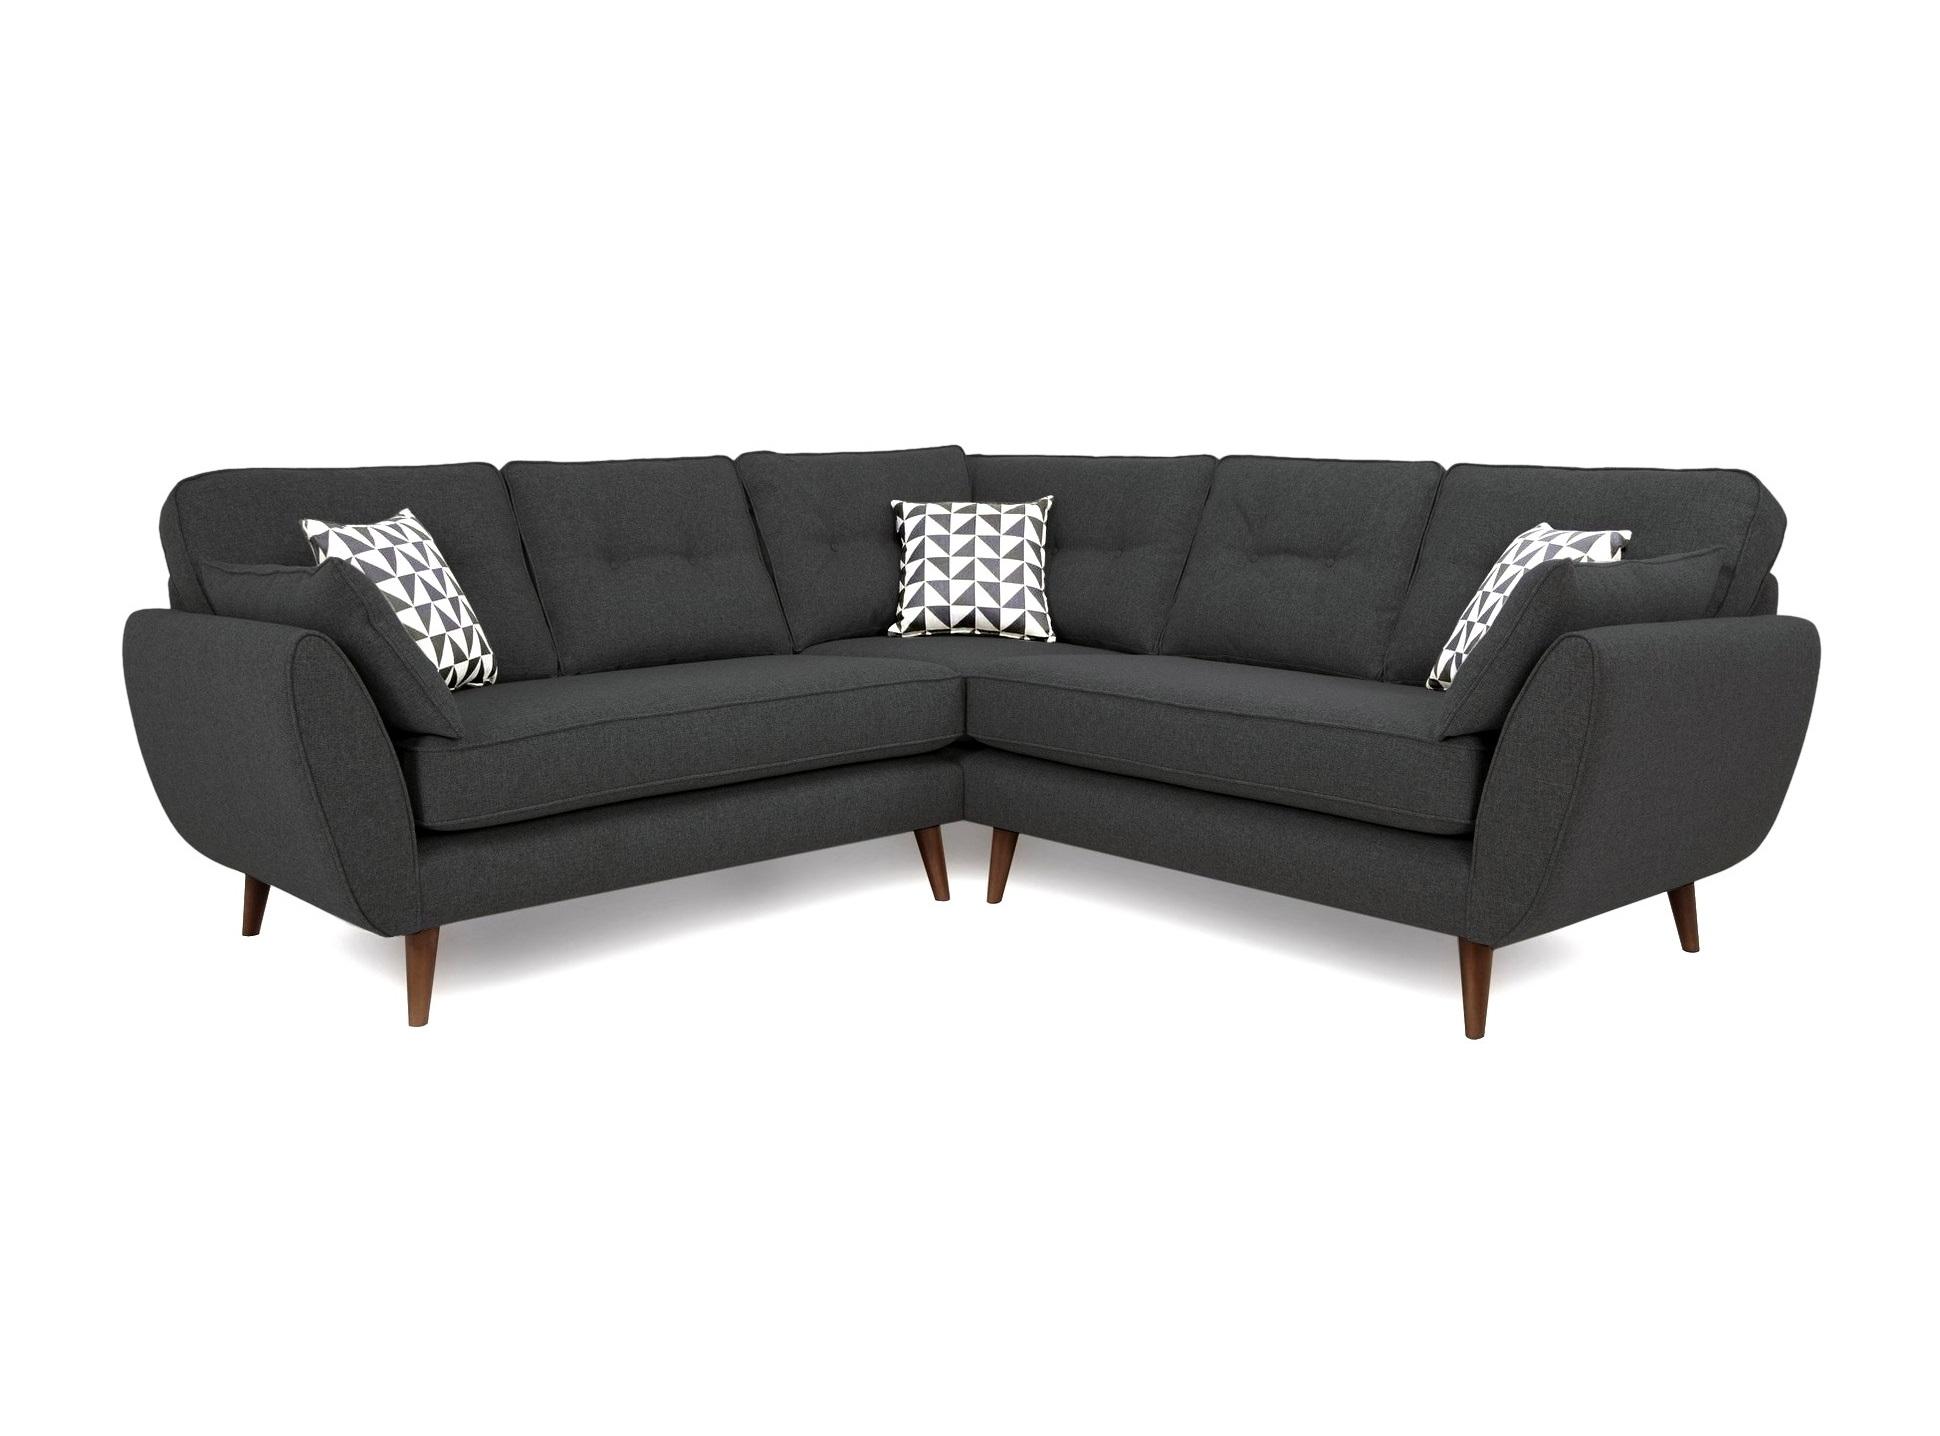 Myfurnish угловой диван vogue full серый  71086/1